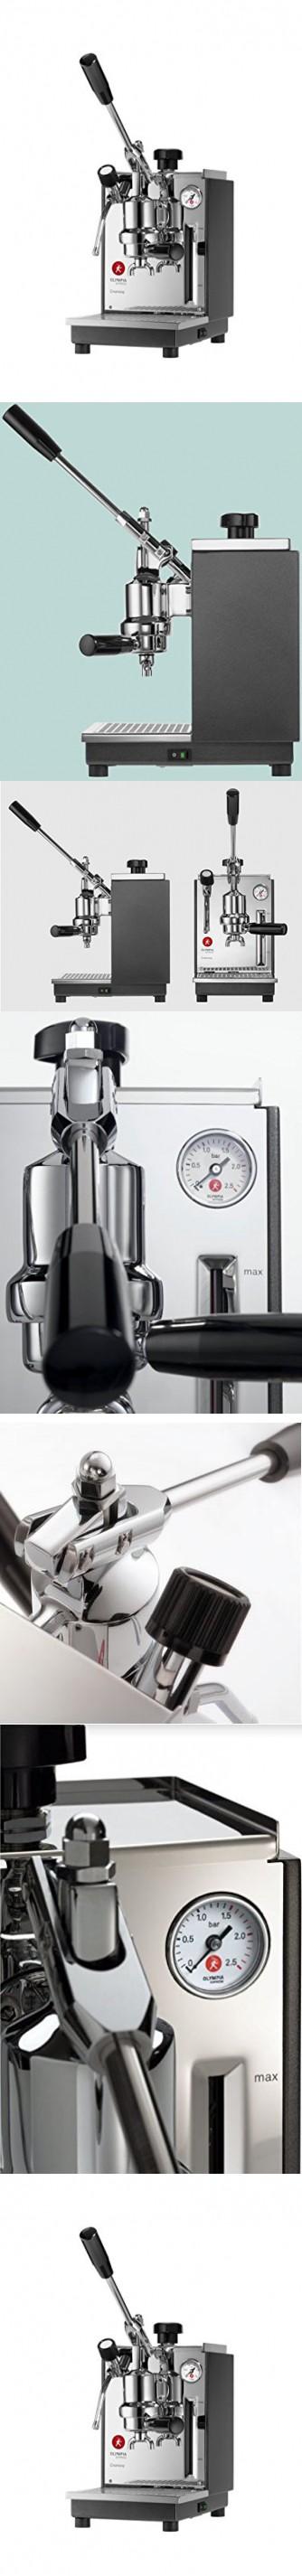 Olympia Cremina Espresso Machine Made In Switzerland Gray Espresso Machine Espresso Made In Switzerland